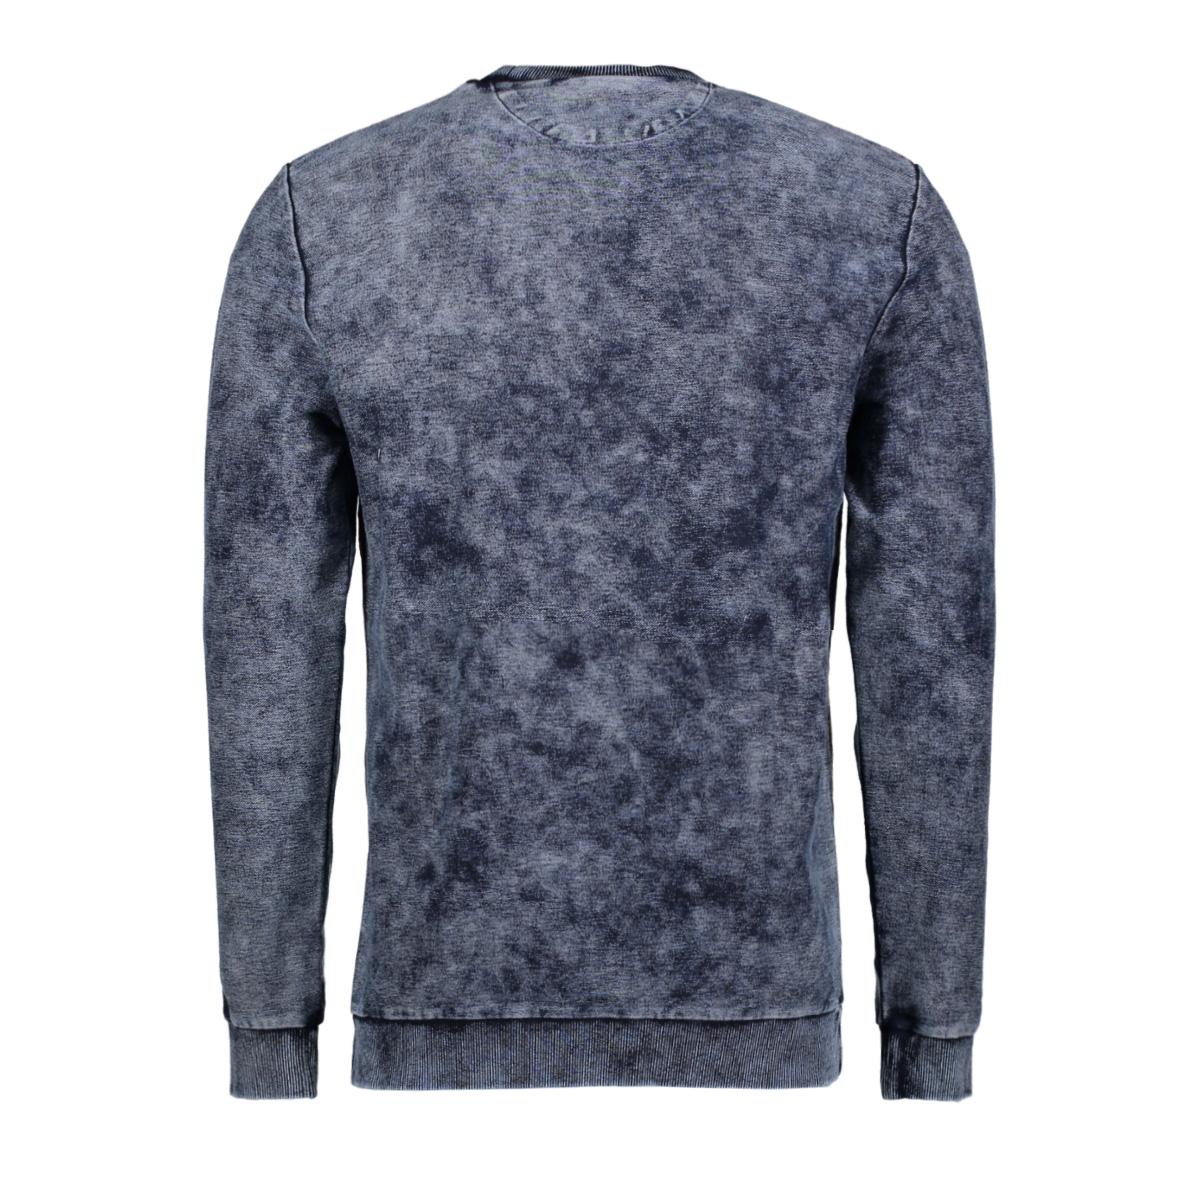 onslutz indigo crew neck sweat 22007541 only & sons sweater dress blues